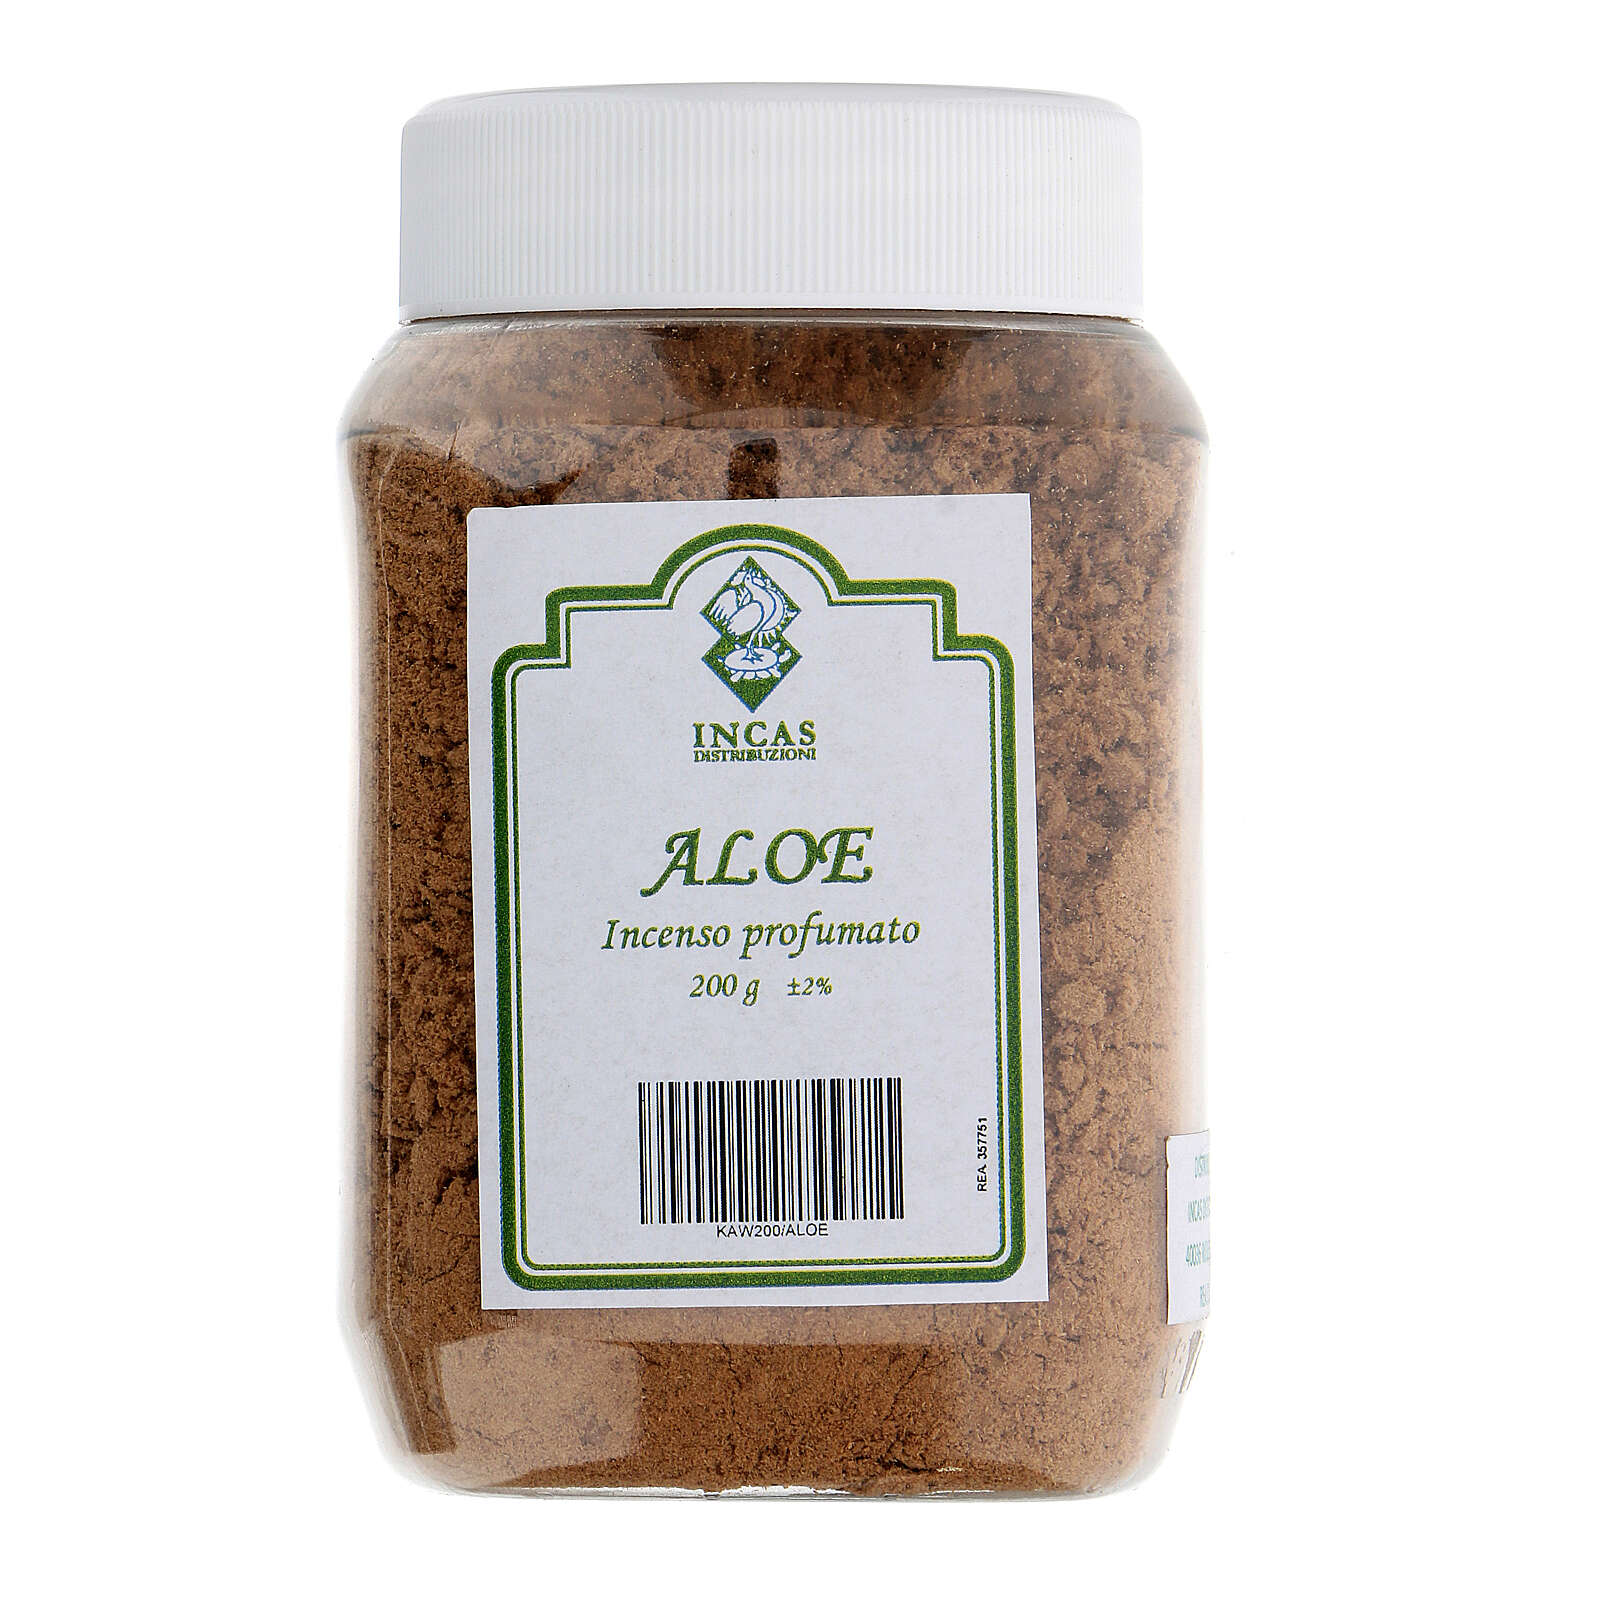 Incense, perfumed Aloe 200gr 3